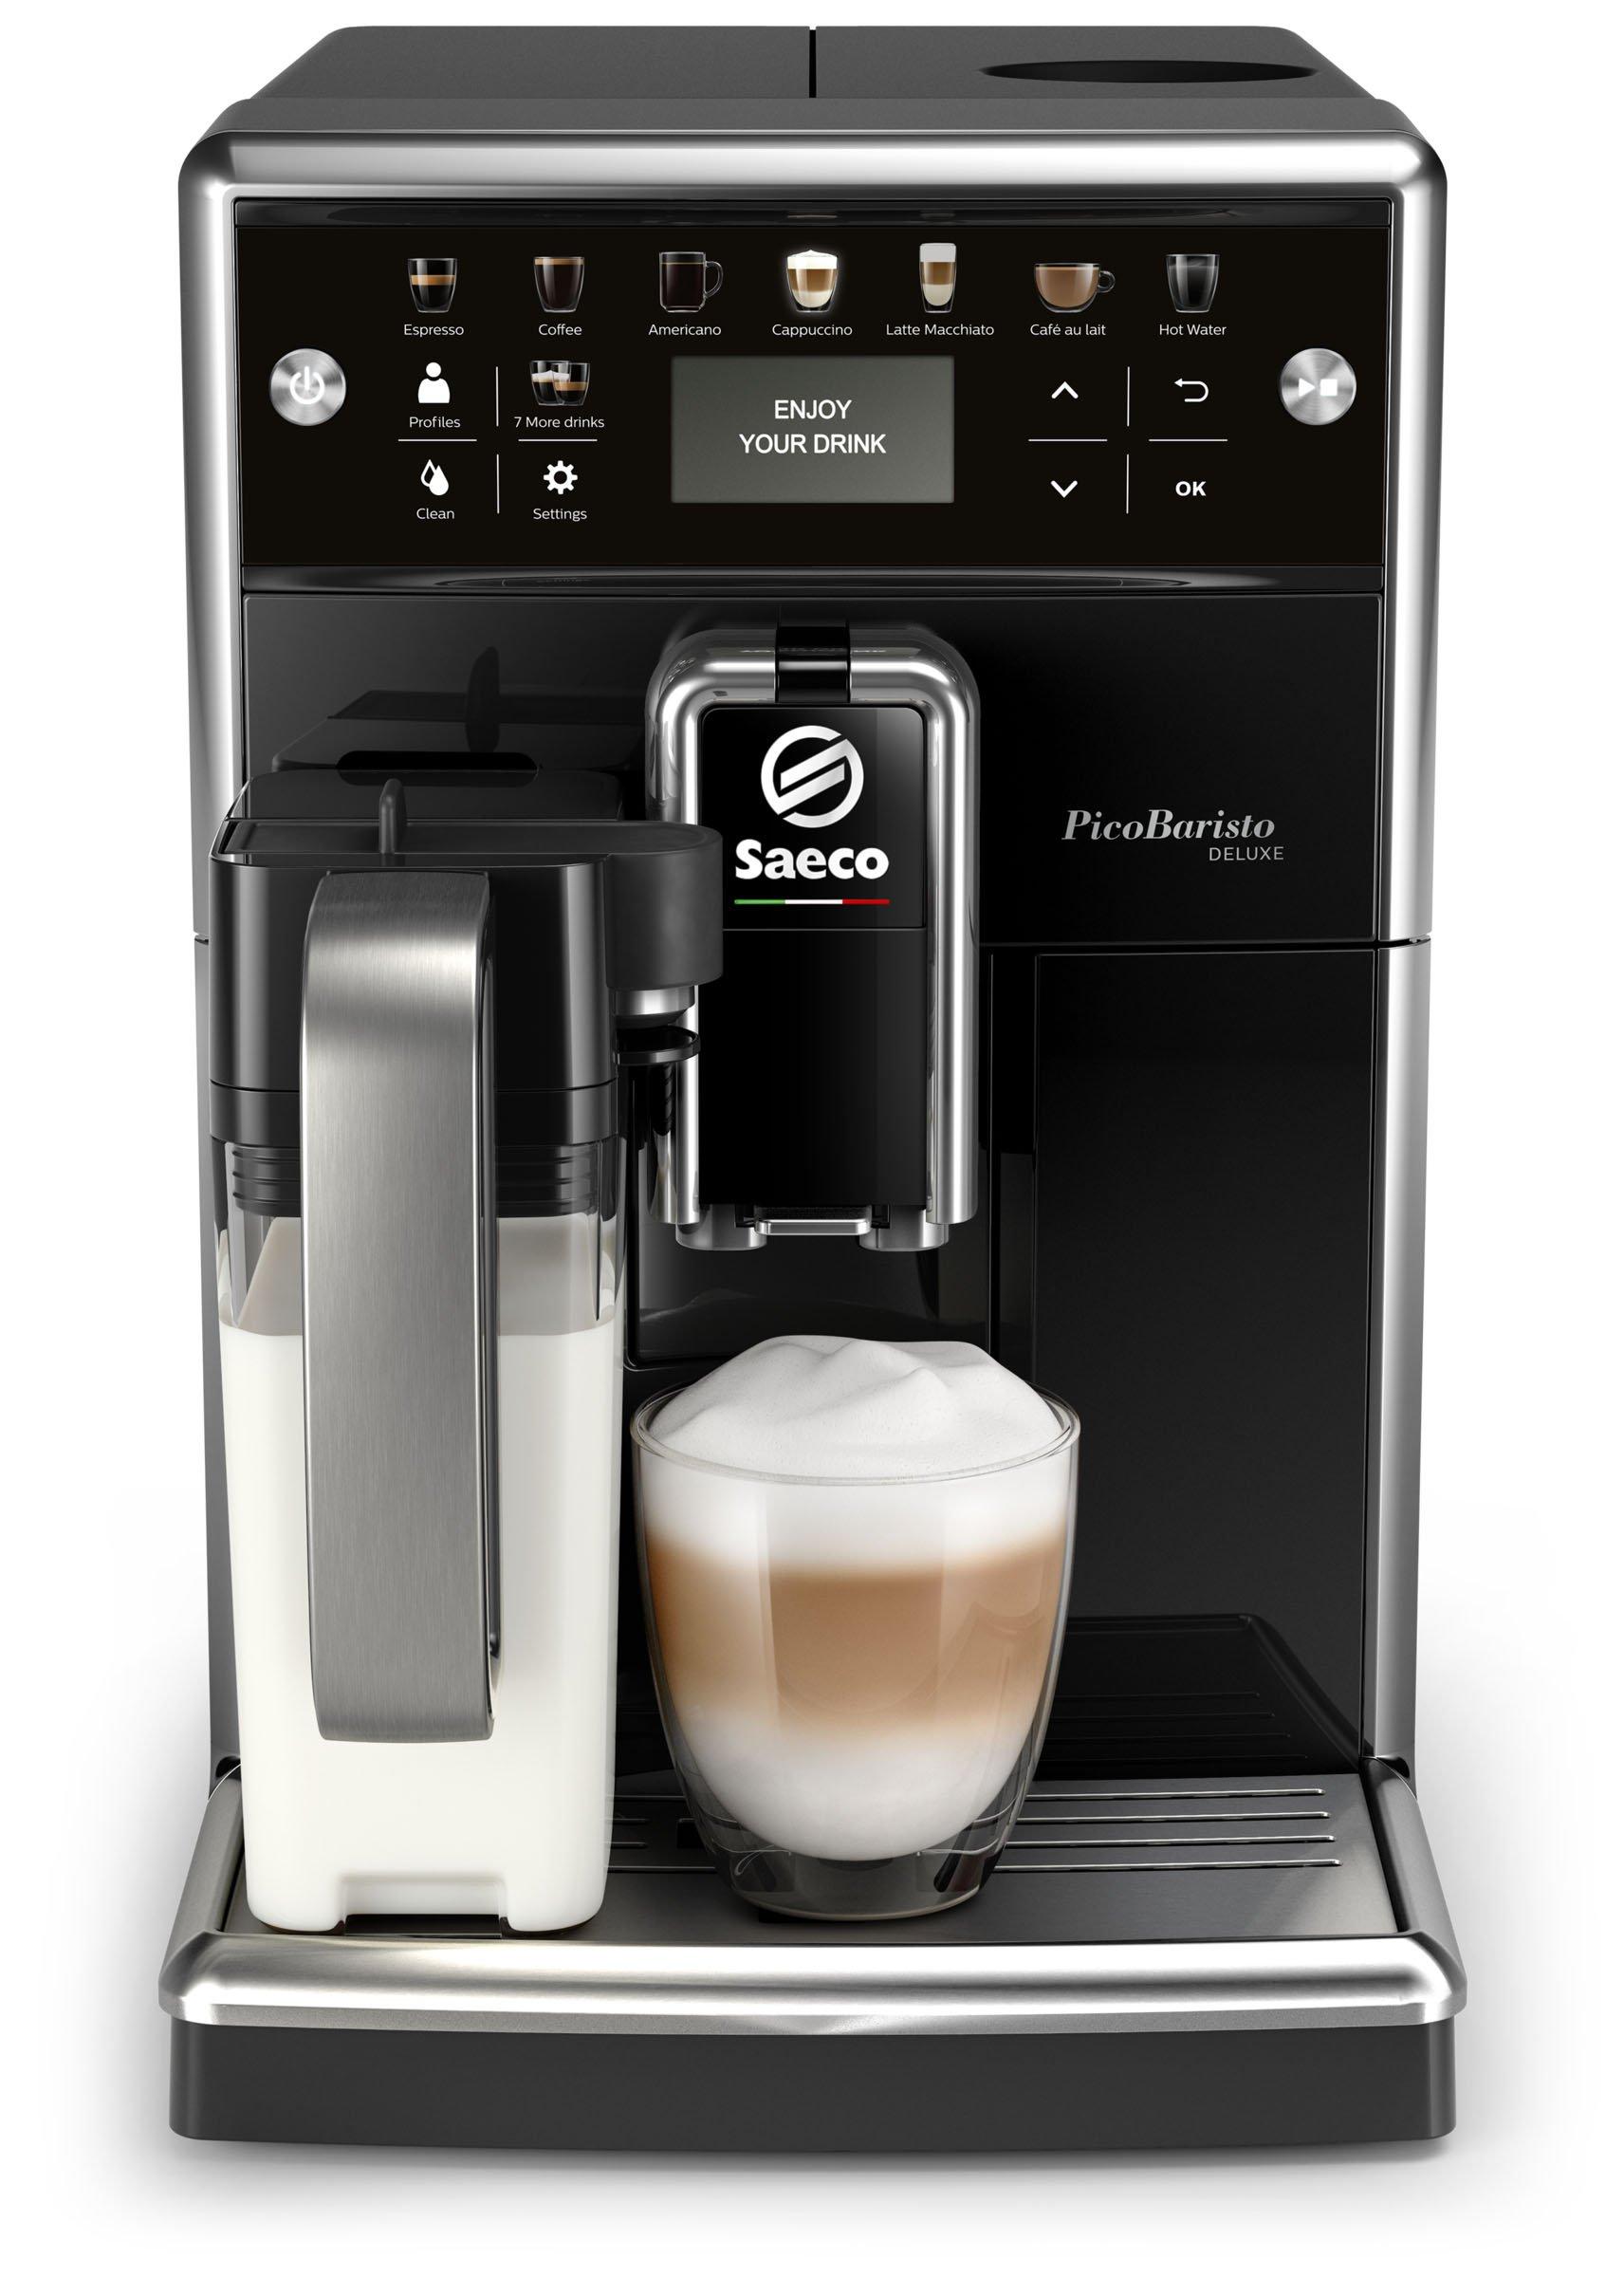 Saeco SM5570/10 PicoBaristo Deluxe Kaffeevollautomat (LED-Display, Milchsystem) schwarz